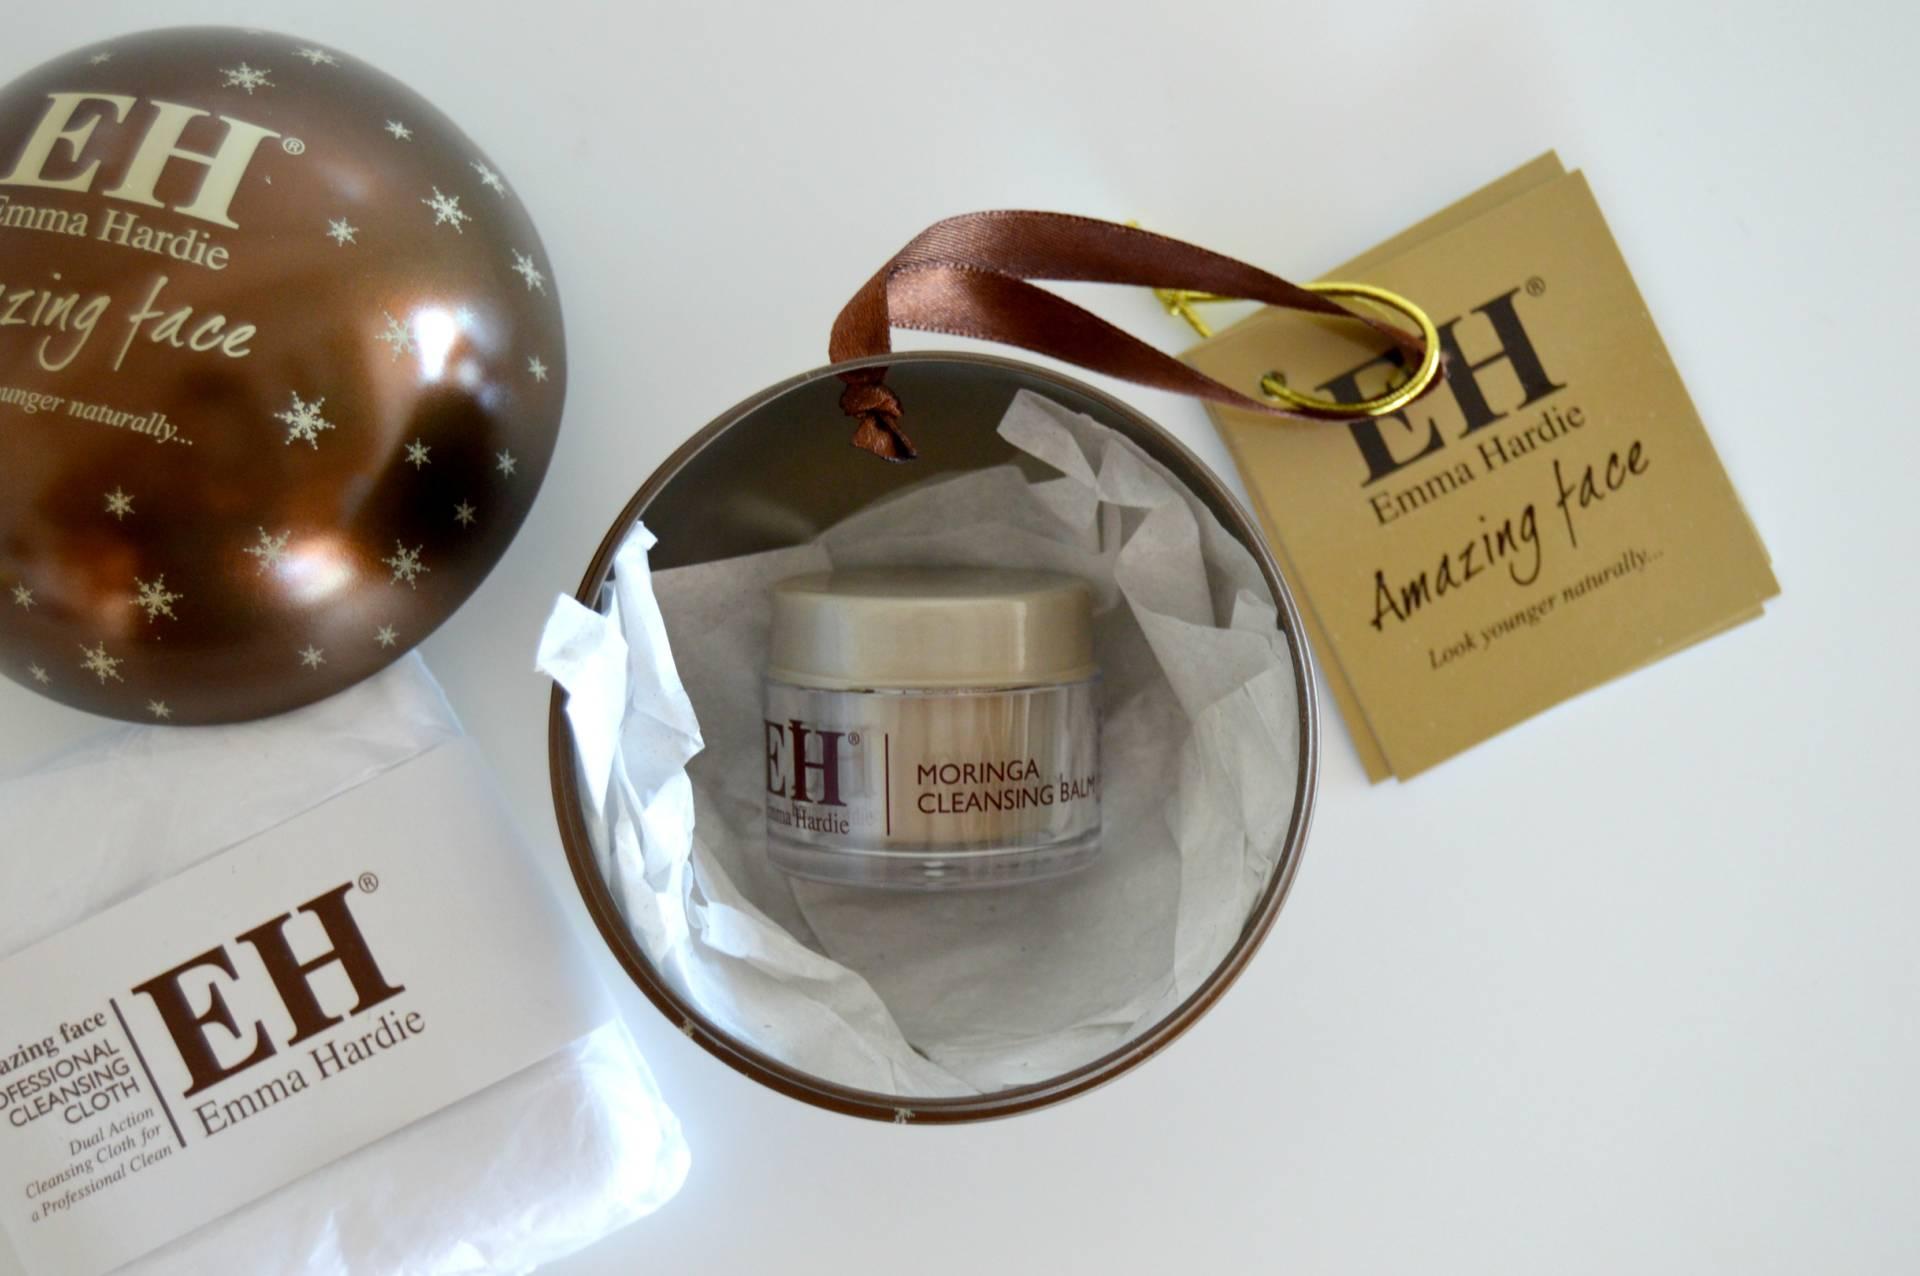 emma-hardie-mini-moringa-cleansing-balm-christmas-ornament-review-inhautepursuit